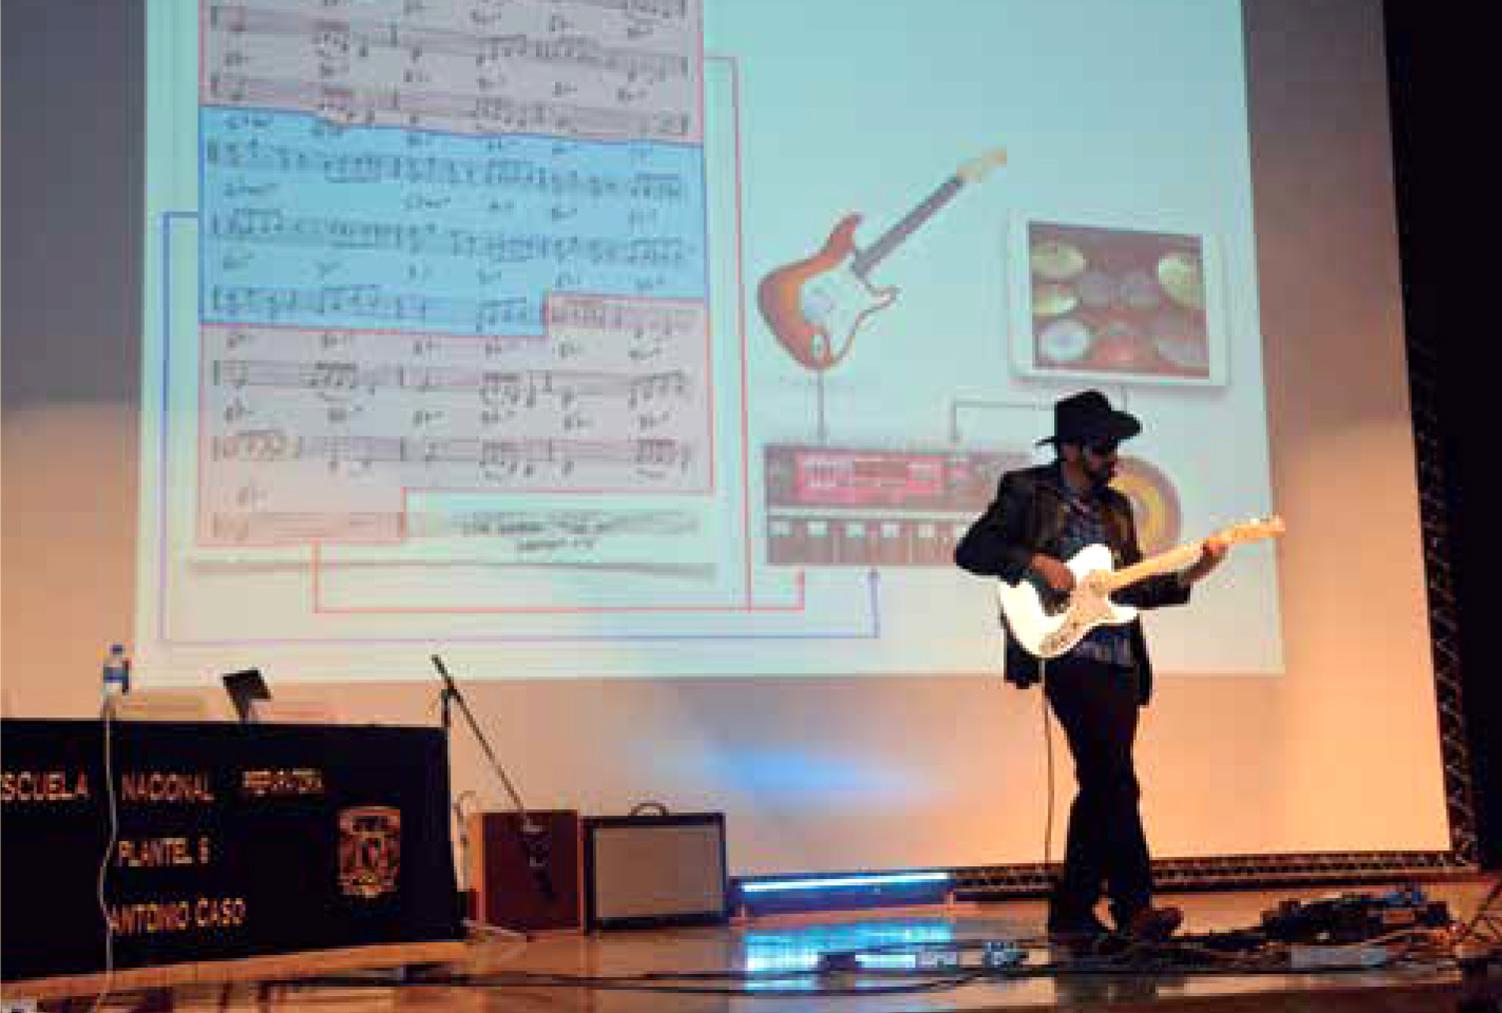 Música y matemáticas para motivar vocaciones